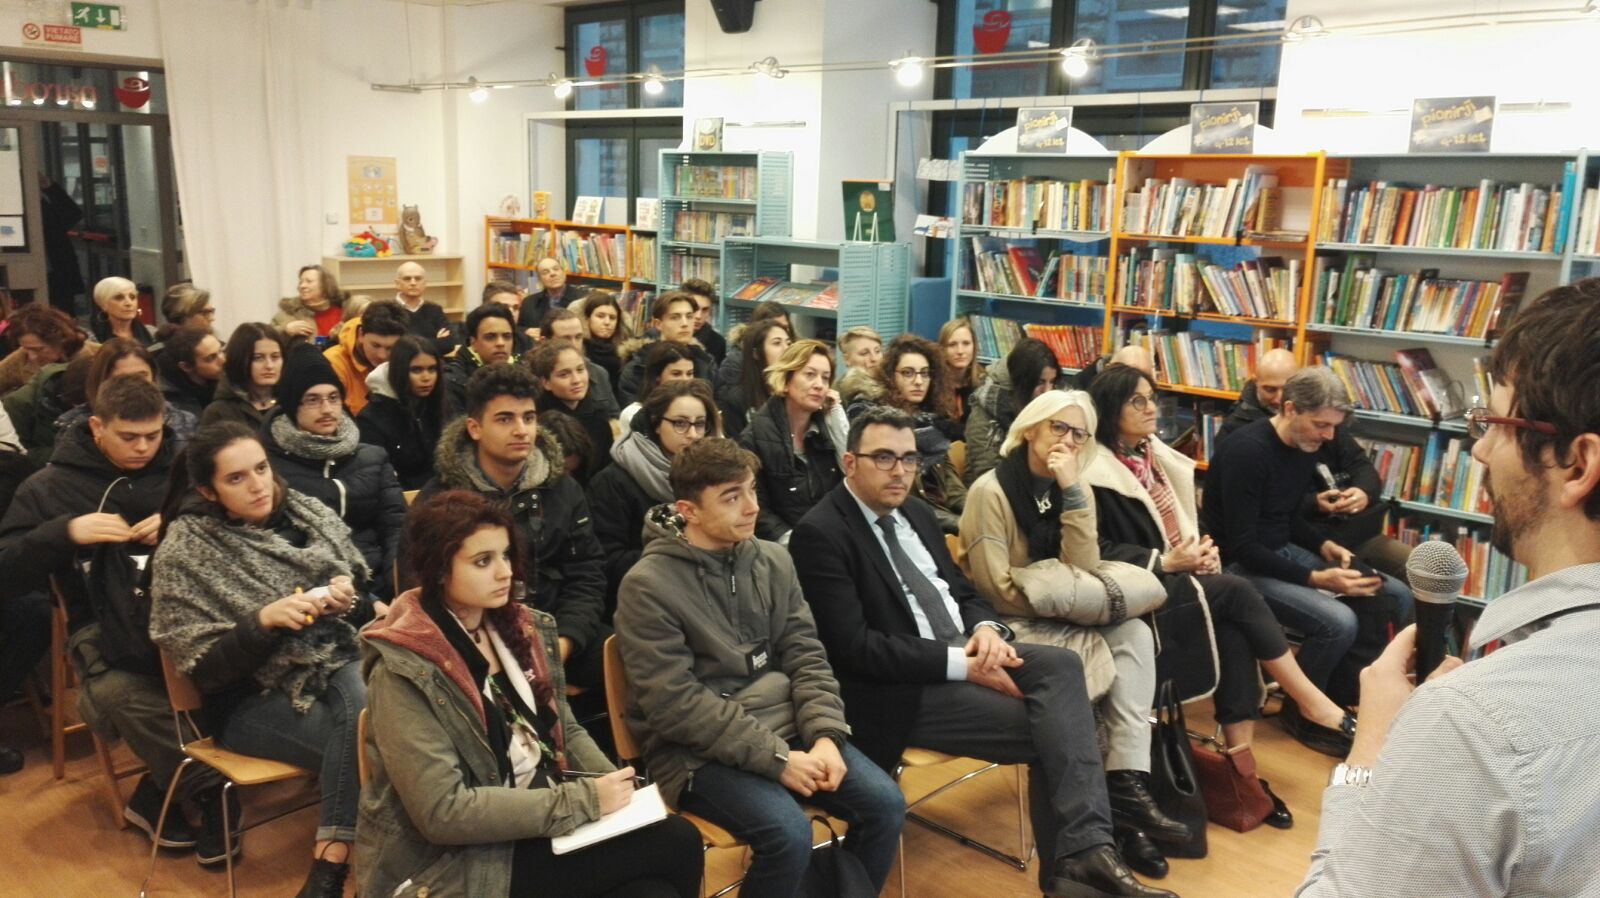 Studenti toscani al Narodni Dom di Trieste